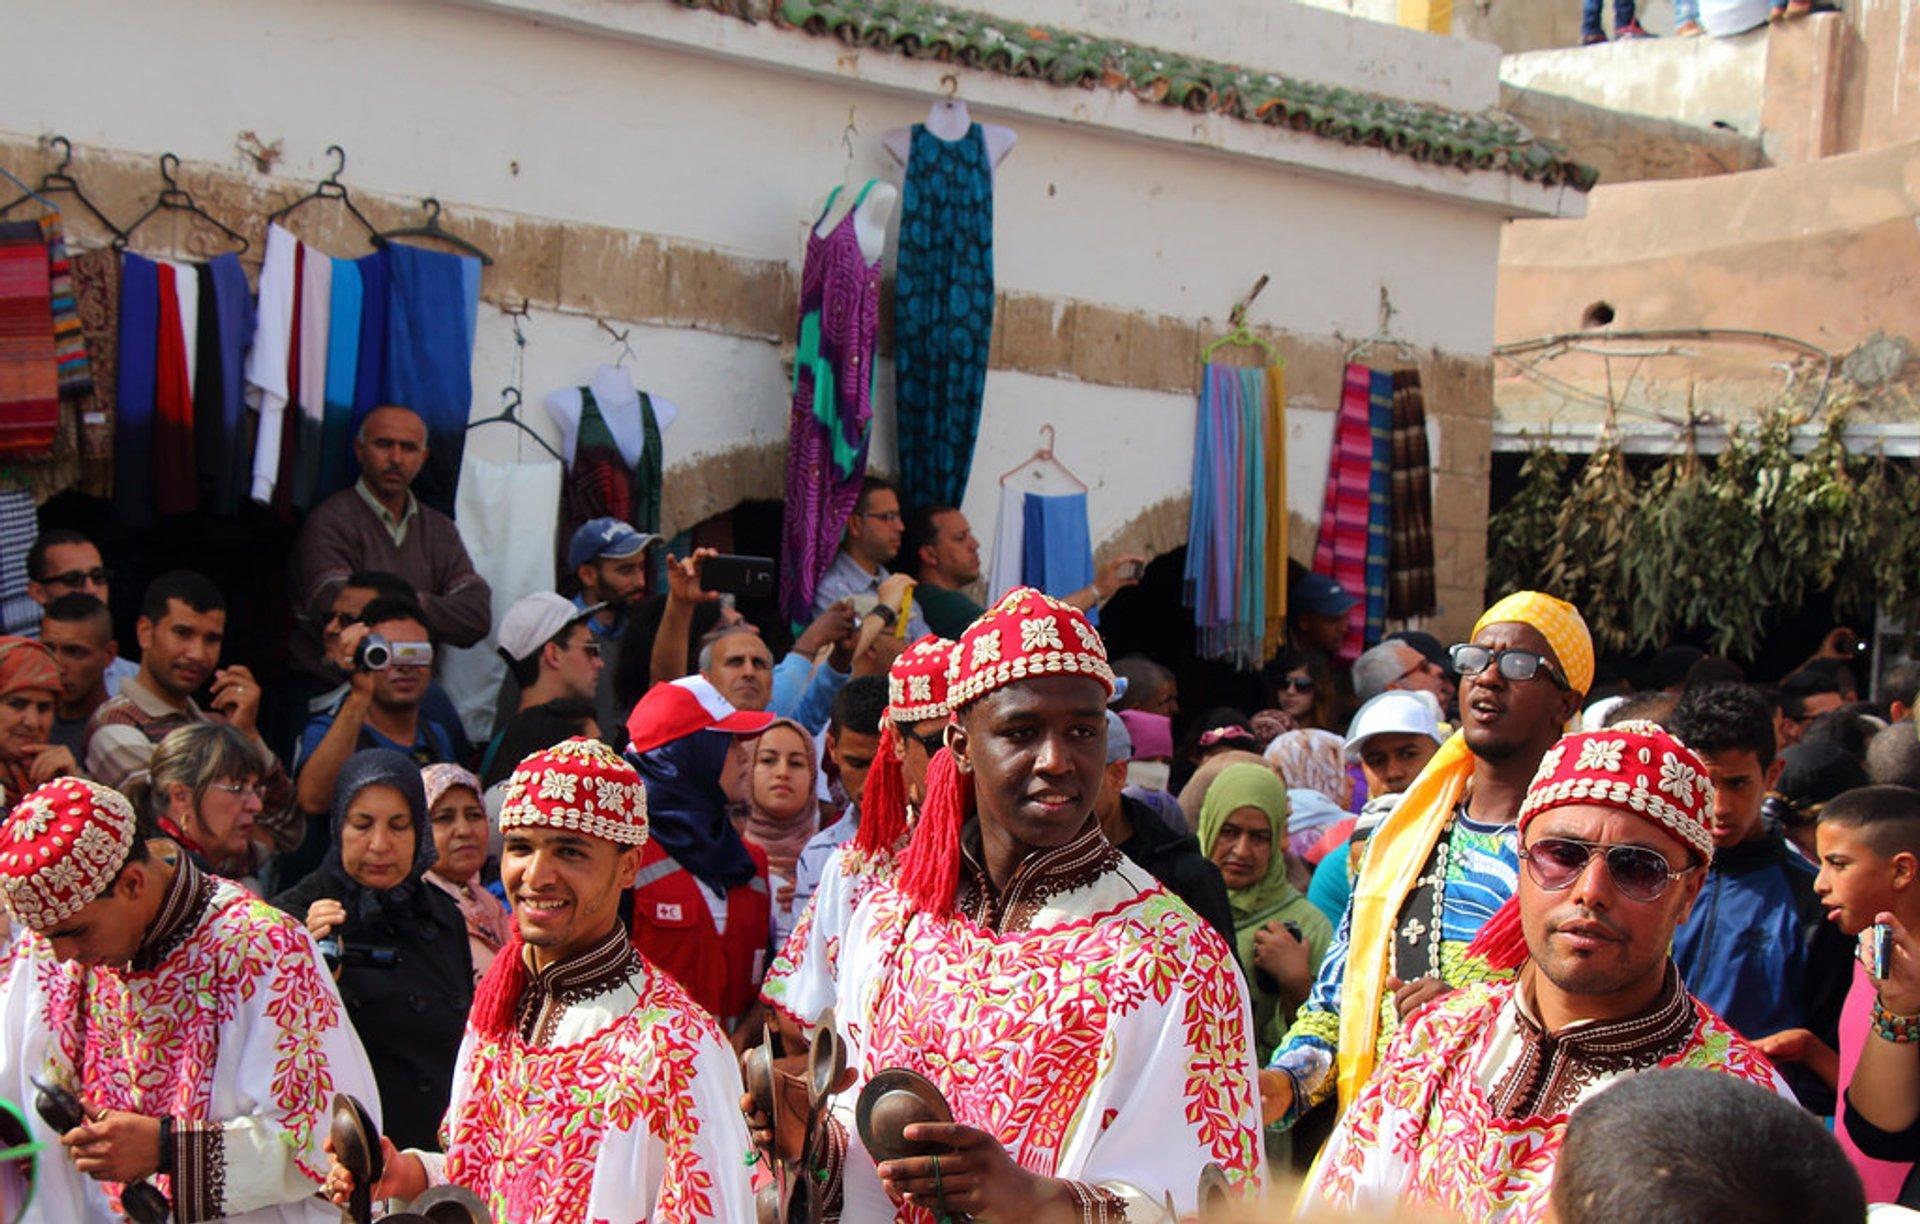 Parade d'ouverture. Festival Gnaoua à Essaouira 2020